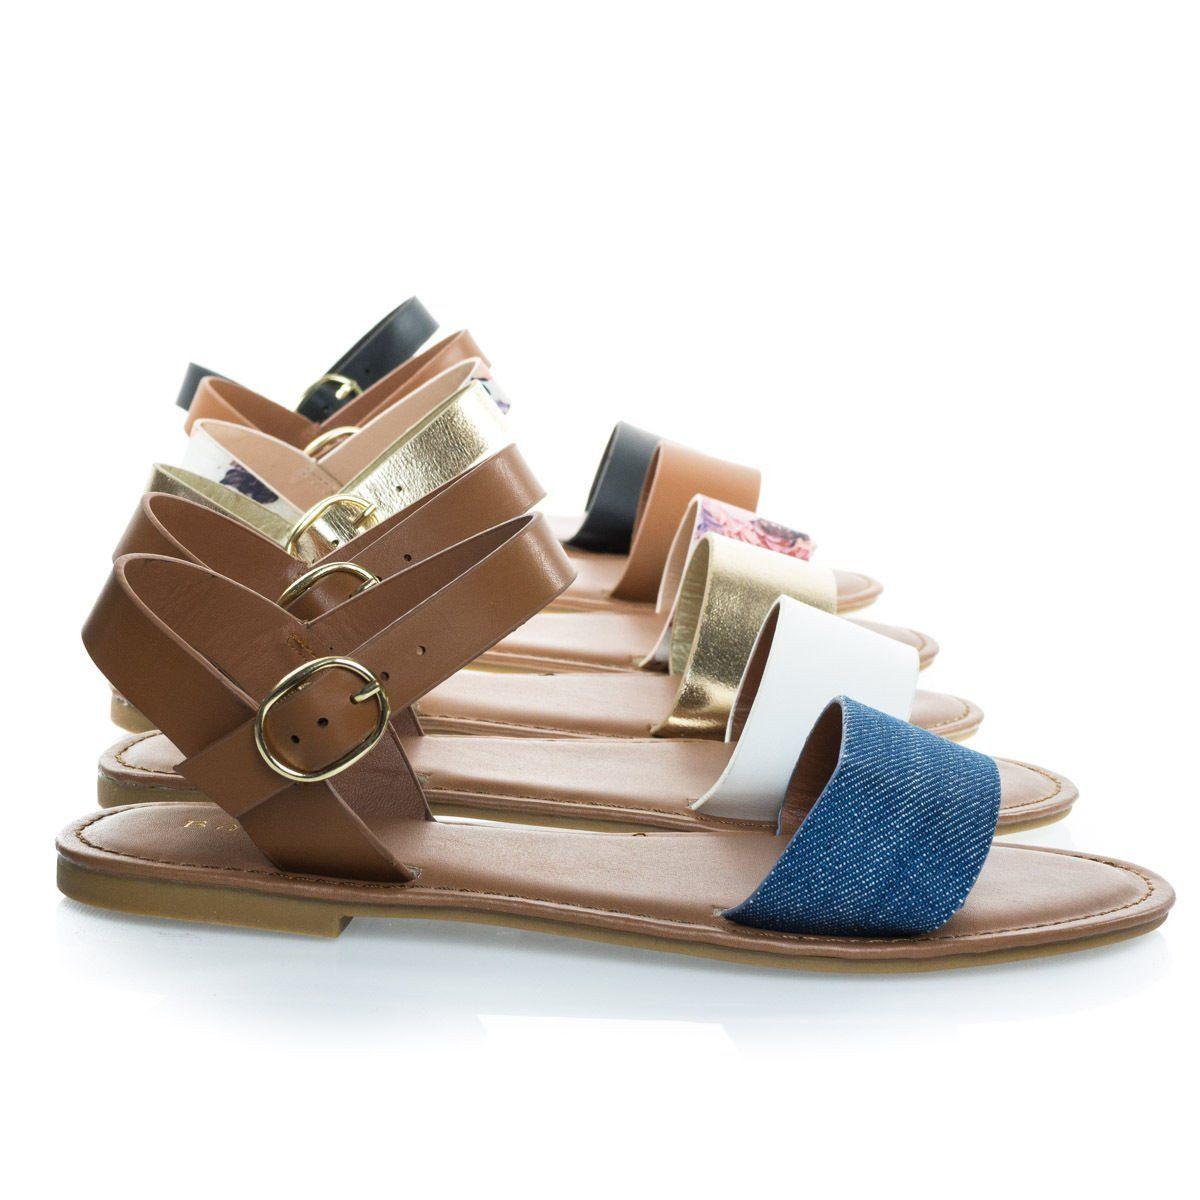 Coastline18 By Bamboo, Open Toe Flat Sandal, Casual Beach Shoes